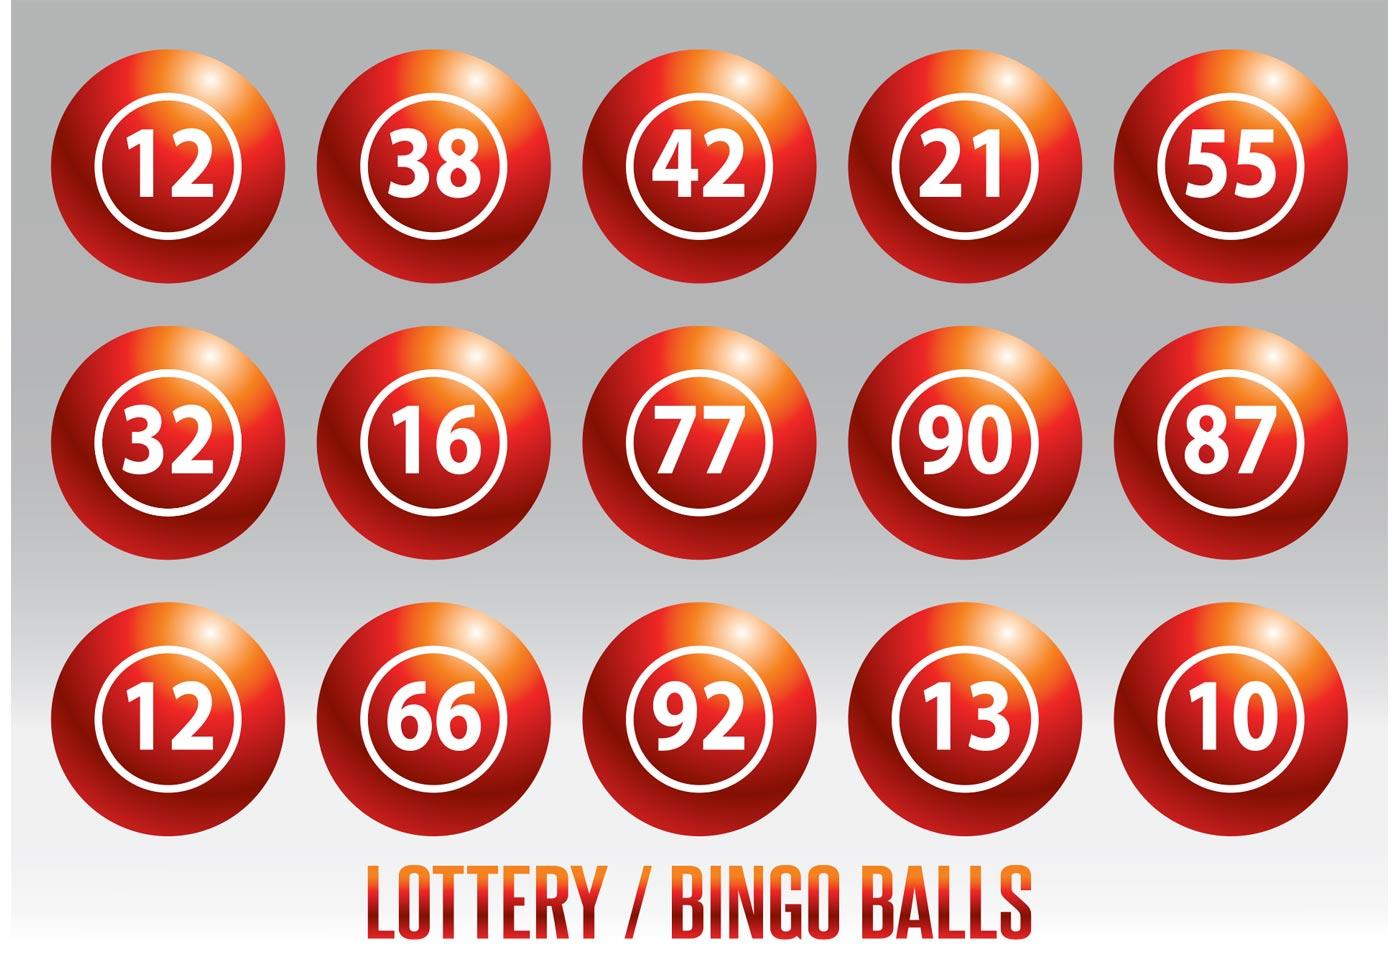 Lottery / Bingo Ball Vector Set - Download Free Vector Art, Stock ...